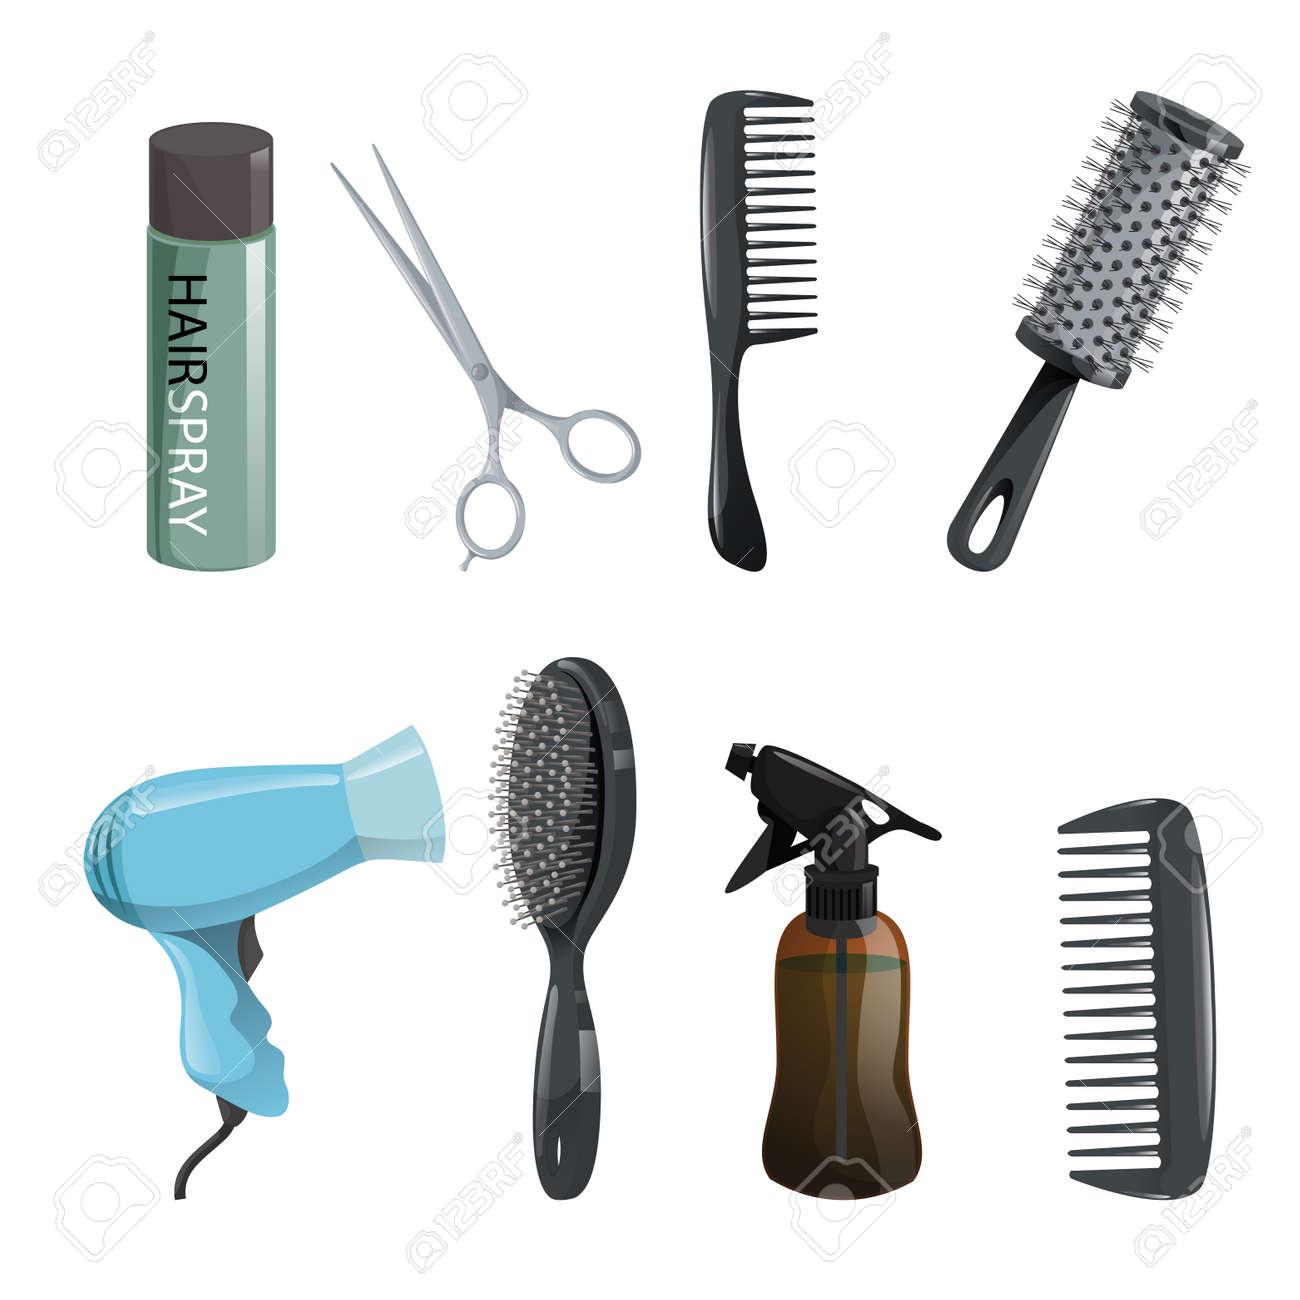 603f887e2d8 Hair beauty salon equipment set. Stock Vector - 91948915